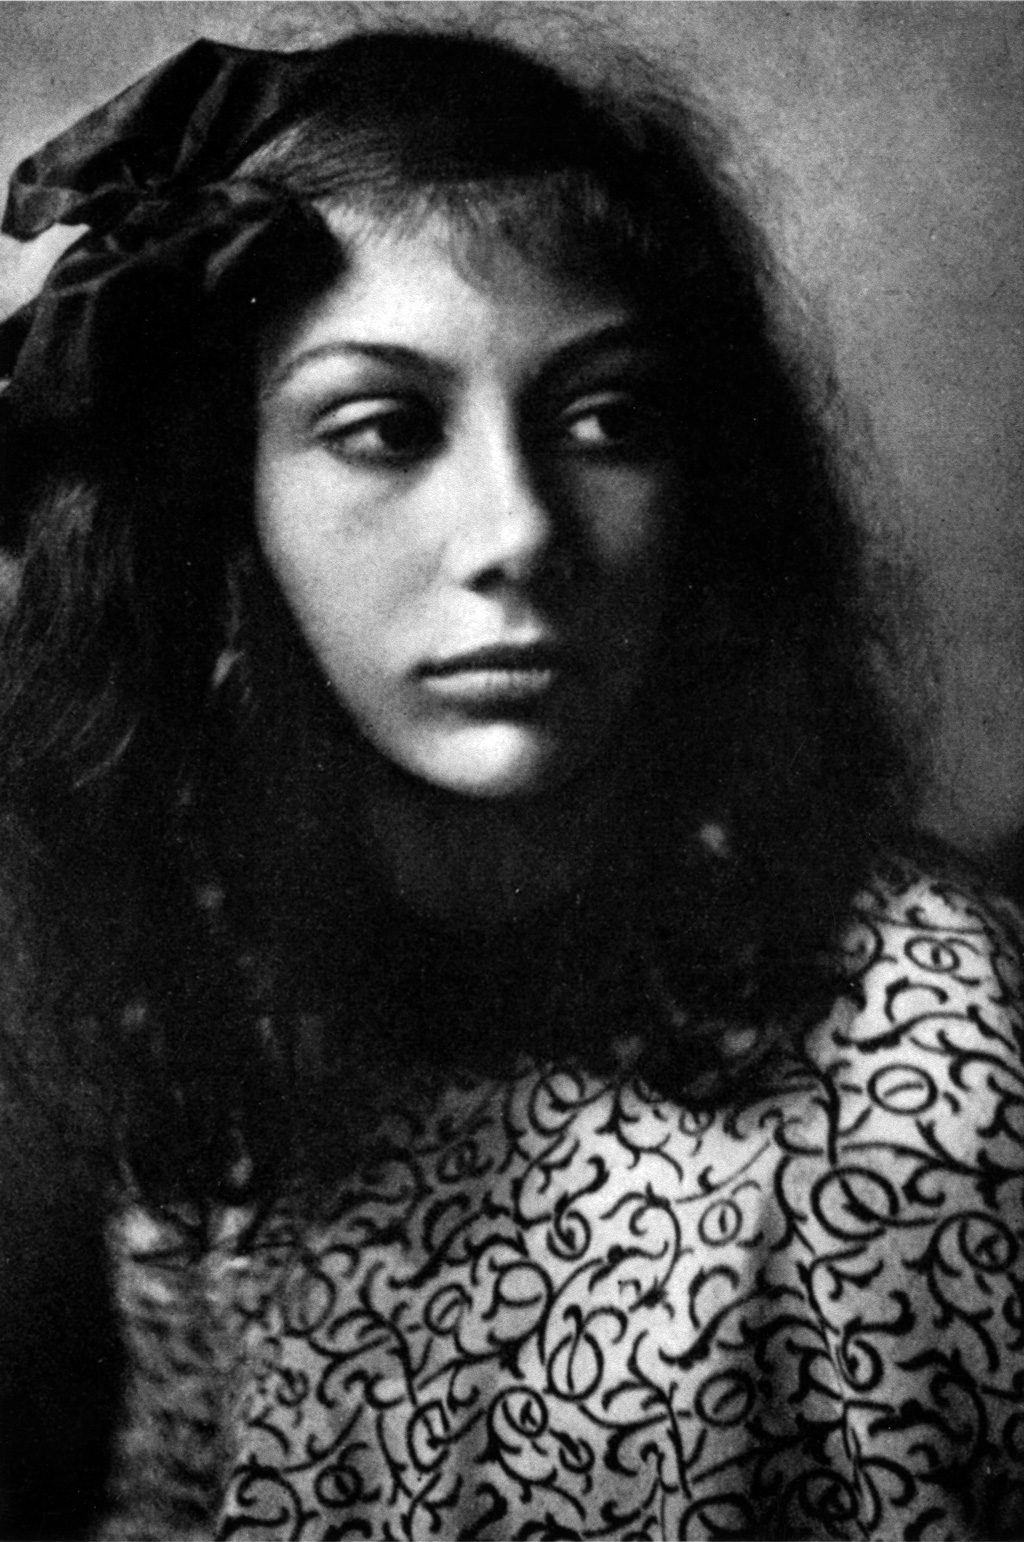 Wera Ouckama Knoop (1900-1919)